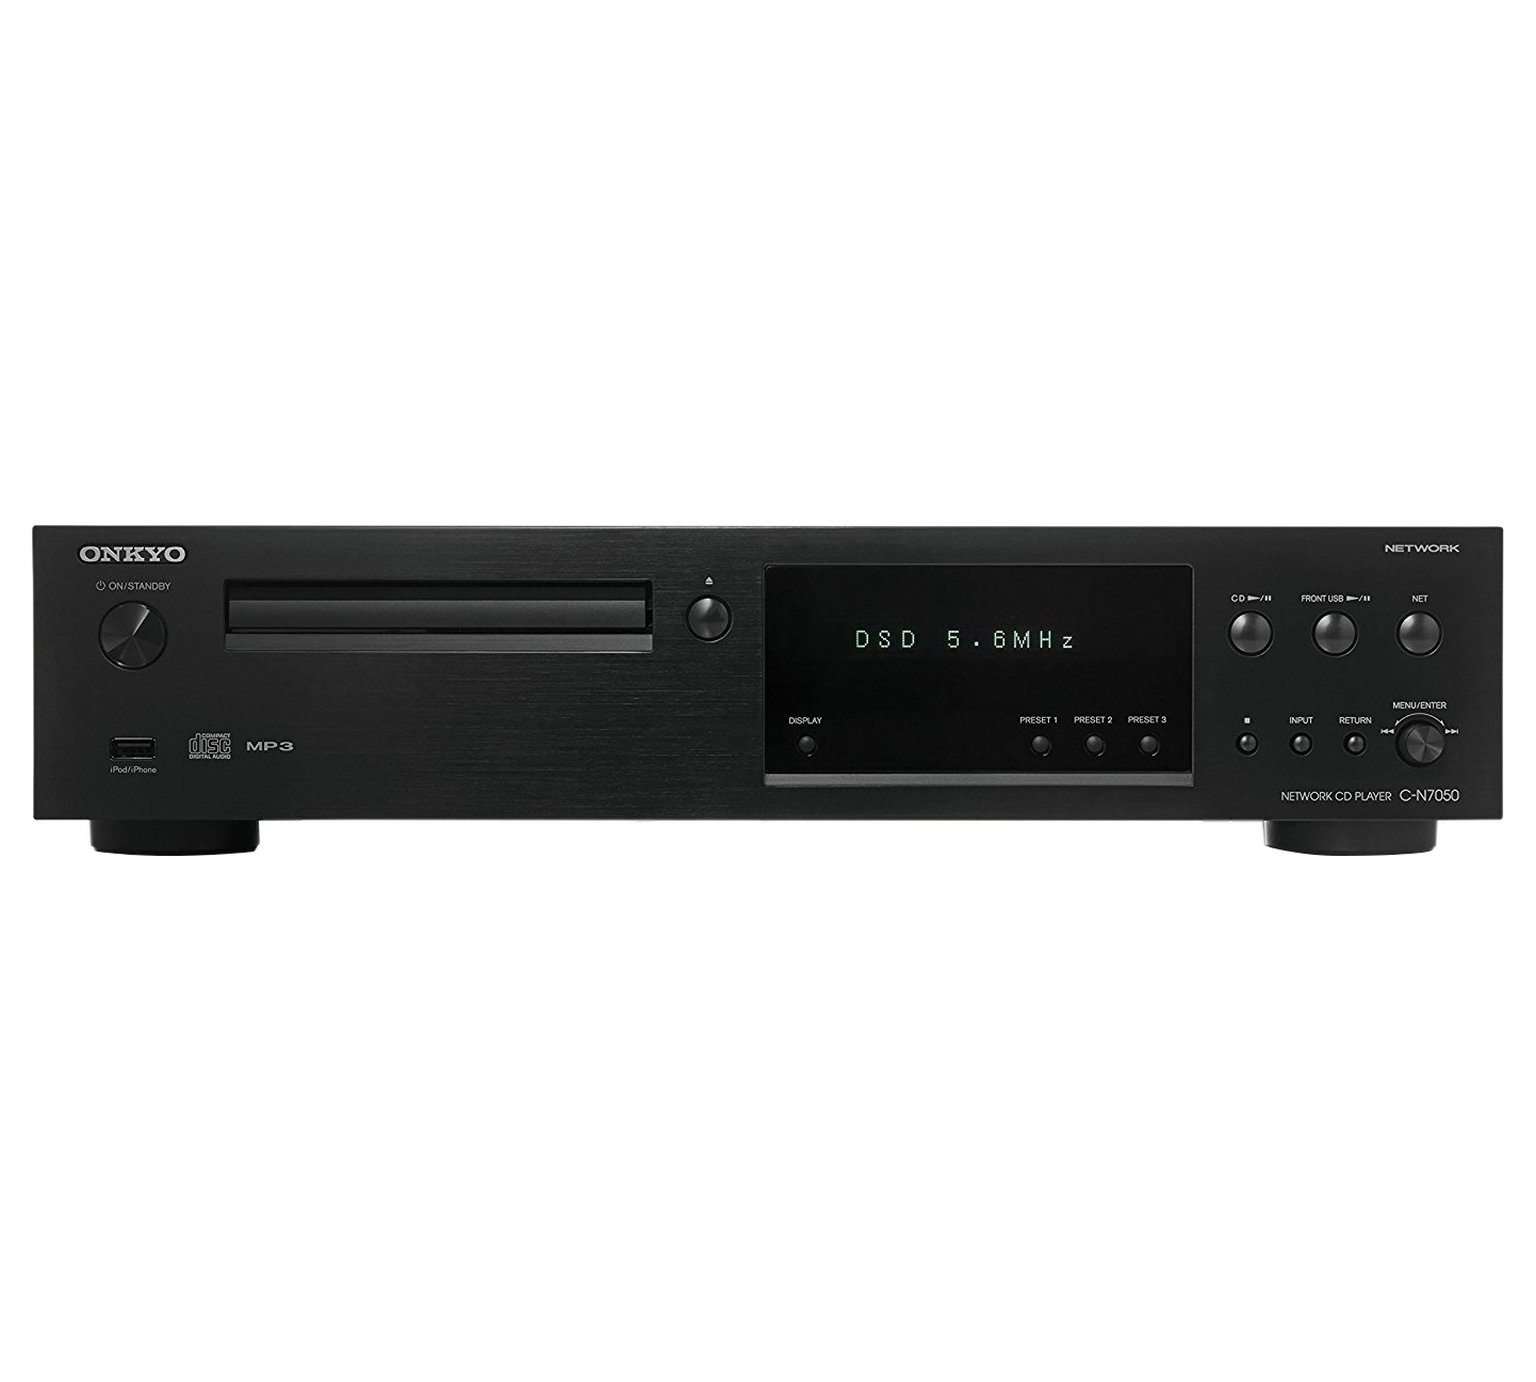 Onkyo C-N7050 CD Internet Radio USB Mini System - Black